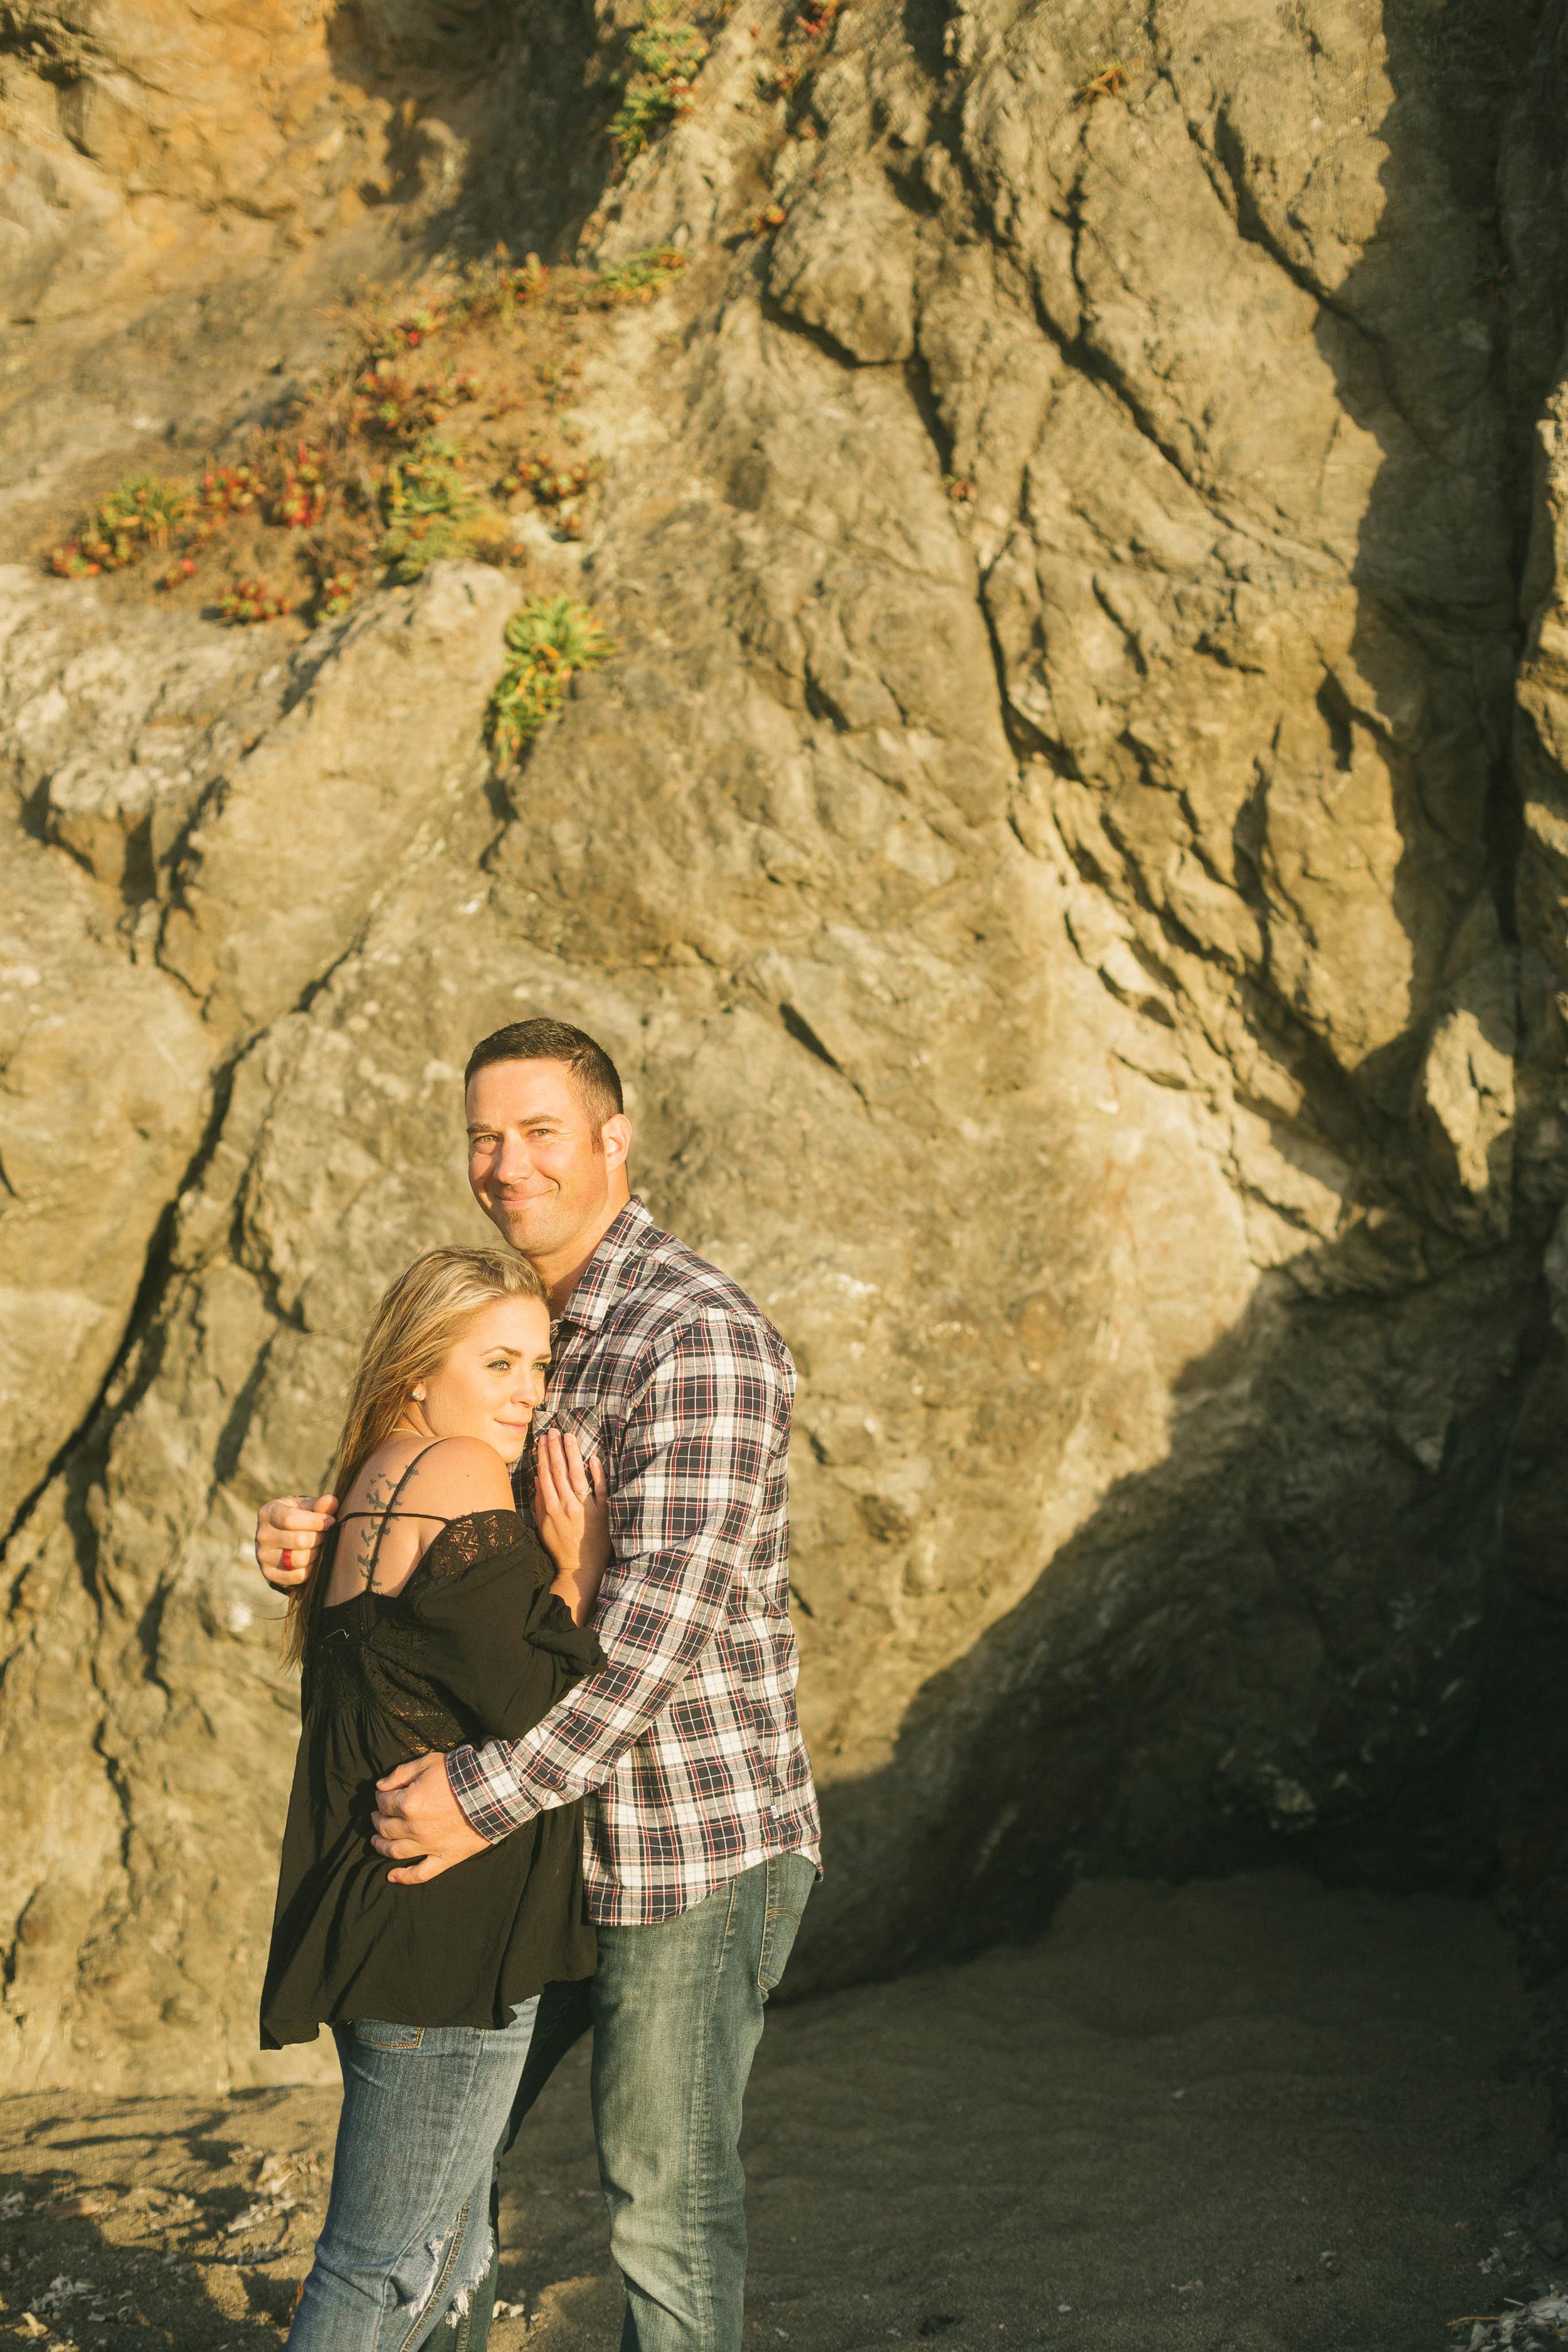 rocky-cliff-hug-couple